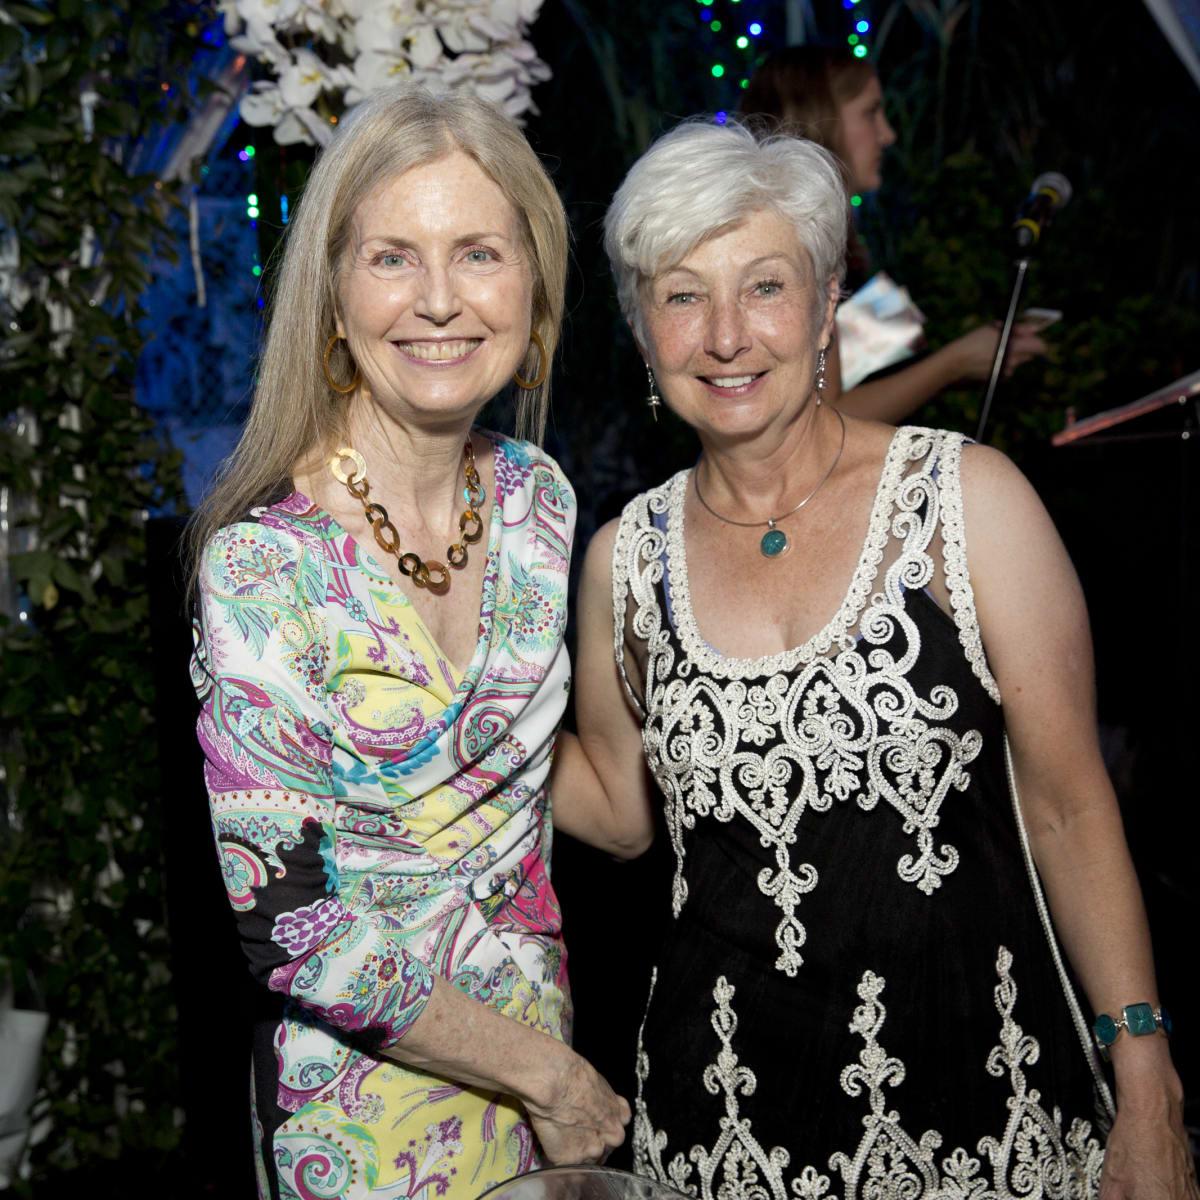 UNICEF Art Auction, 5/16  Ann Holmes, Sonya Renner